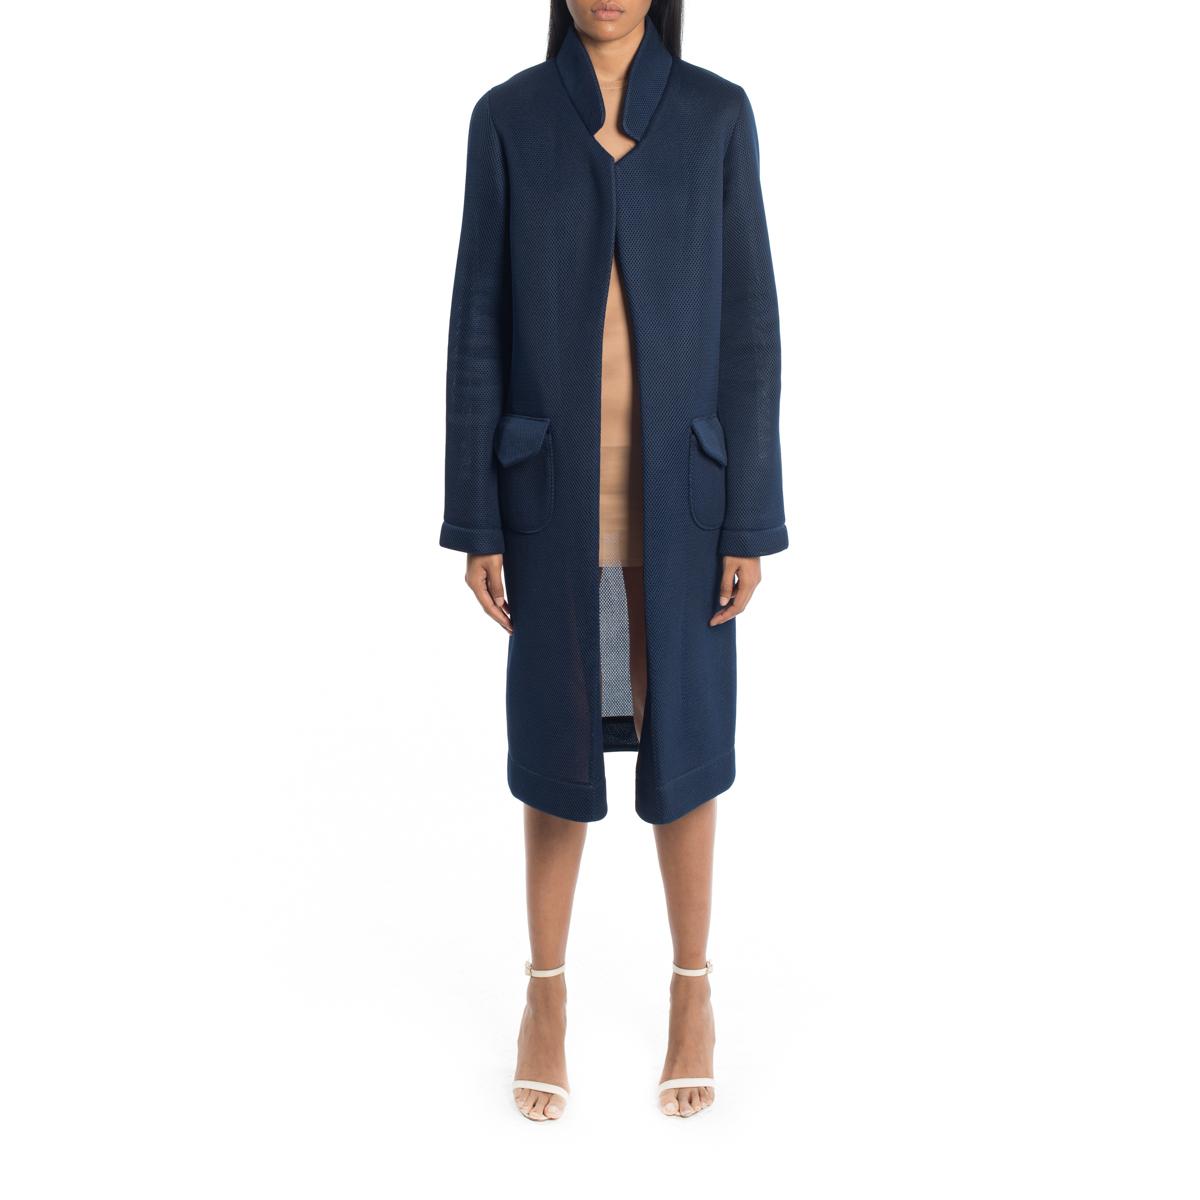 Elodie Mesh Overcoat